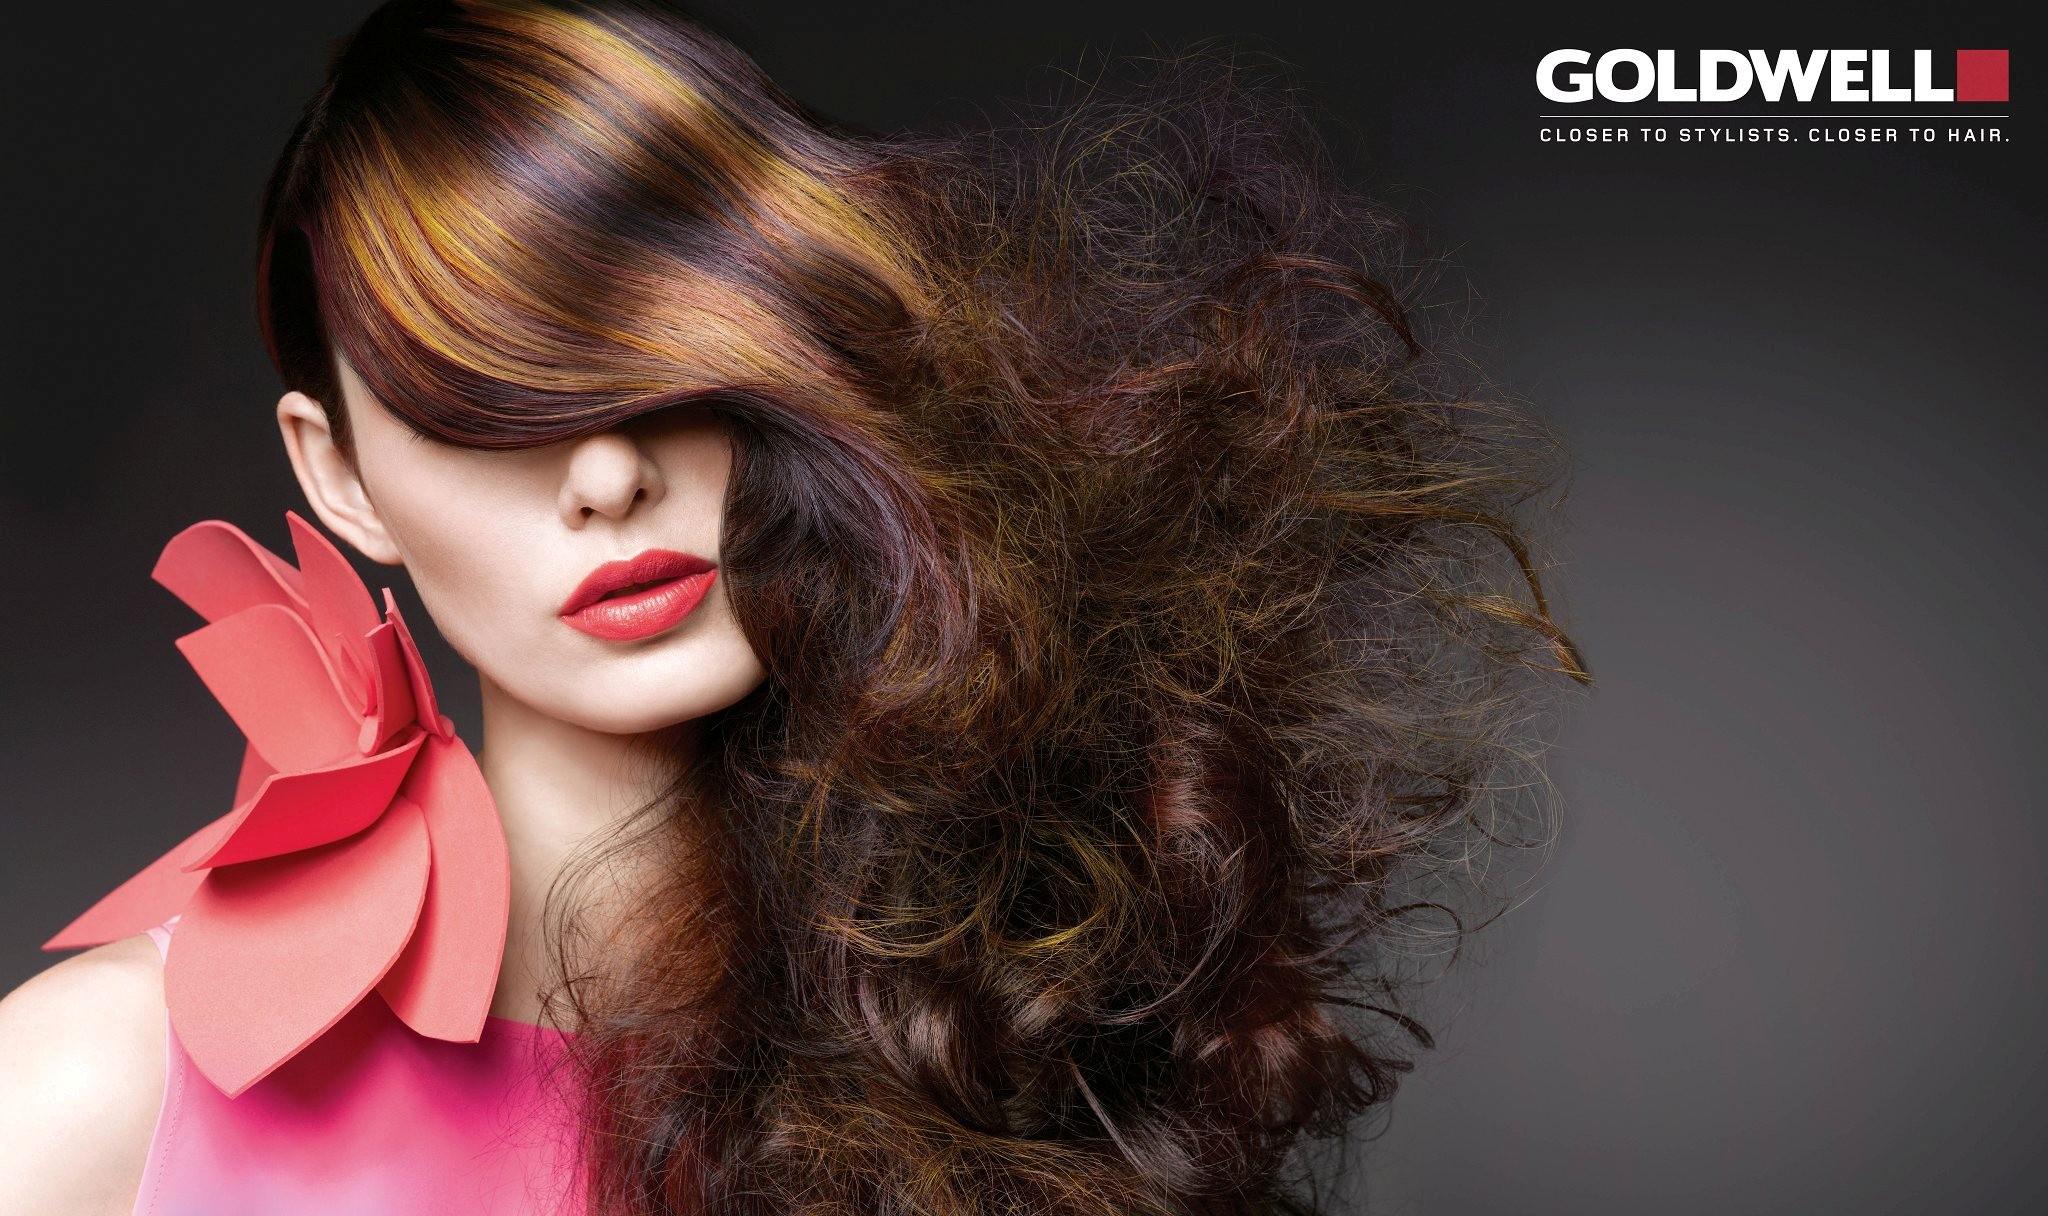 Goldwell Colorglow Iq Regenerative Hair Masques Lily